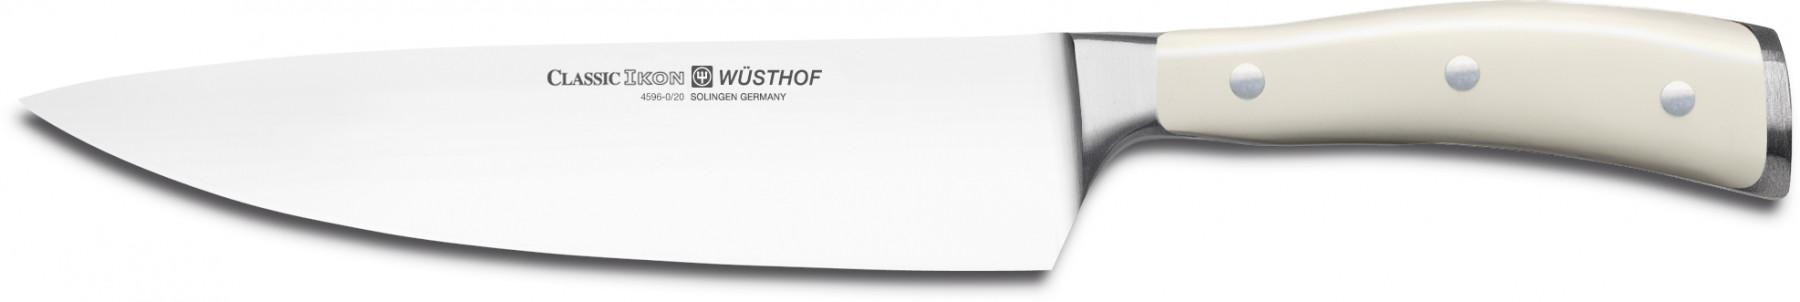 Wüsthof Dreizack Classic Ikon Creme Kochmesser 20cm